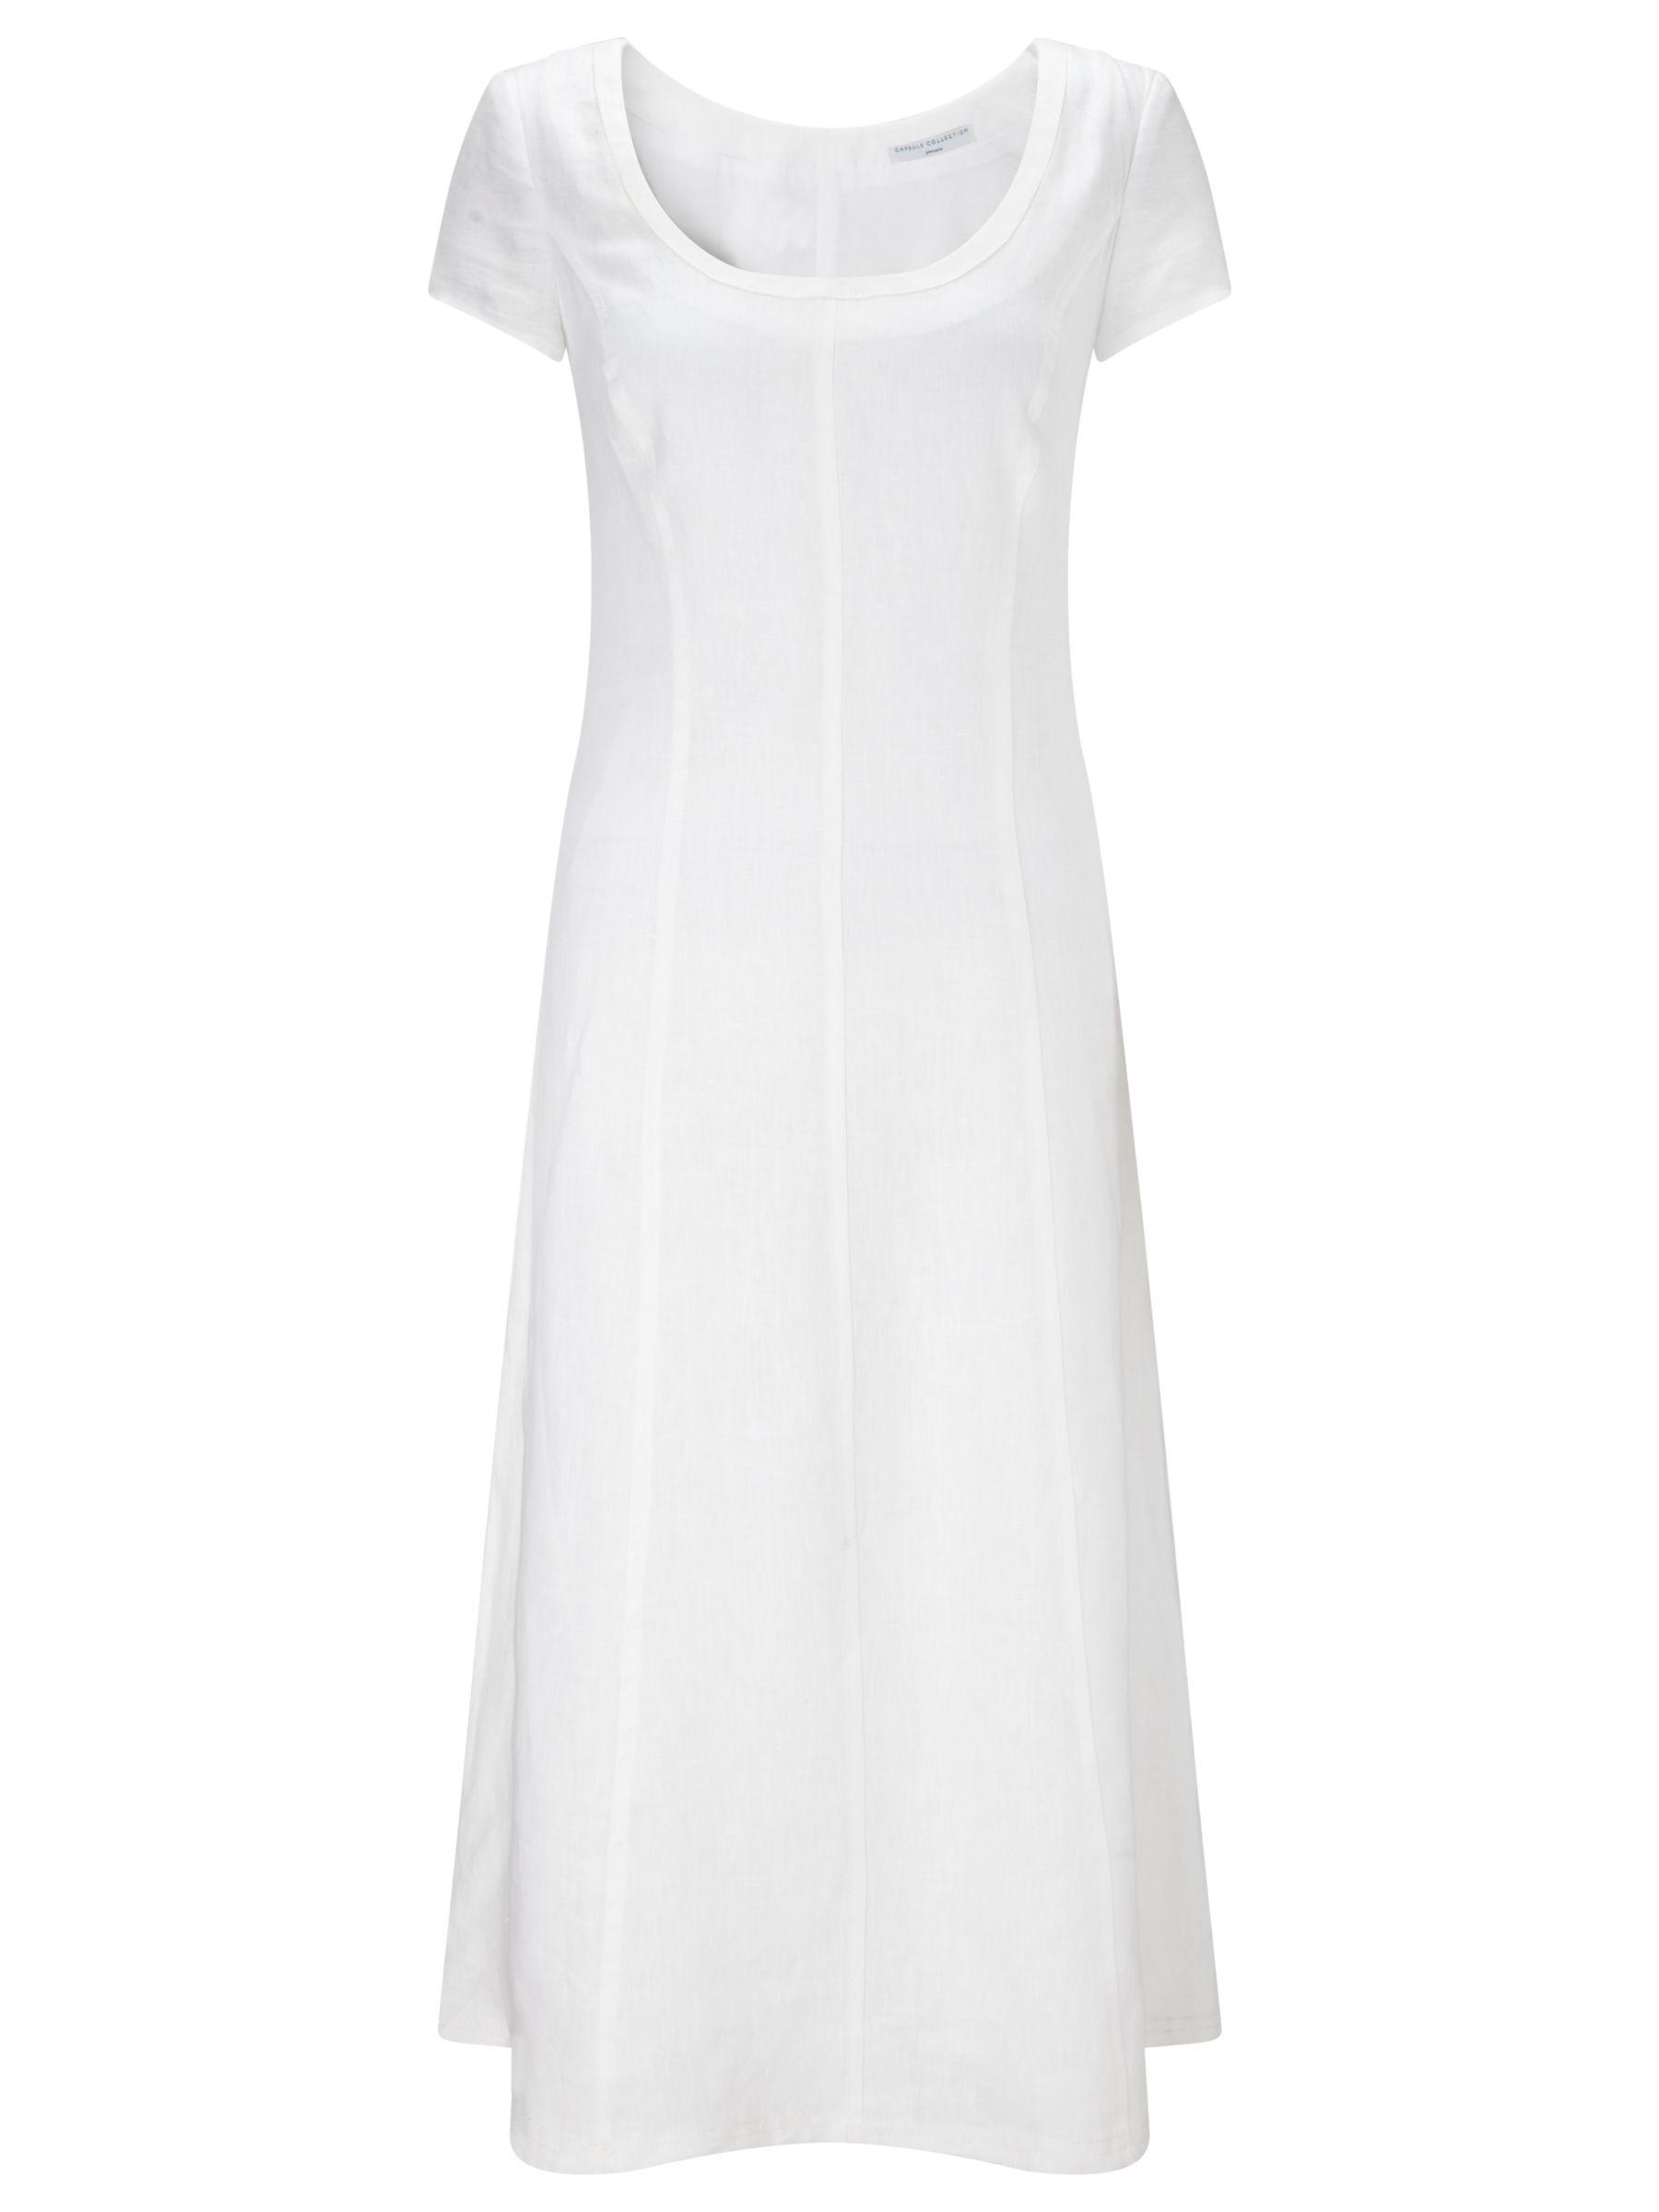 john lewis capsule collection linen dress white, john, lewis, capsule, collection, linen, dress, white, john lewis capsule collection, 14 18 10 16 20 12, women, womens dresses, brands a-k, 1913949